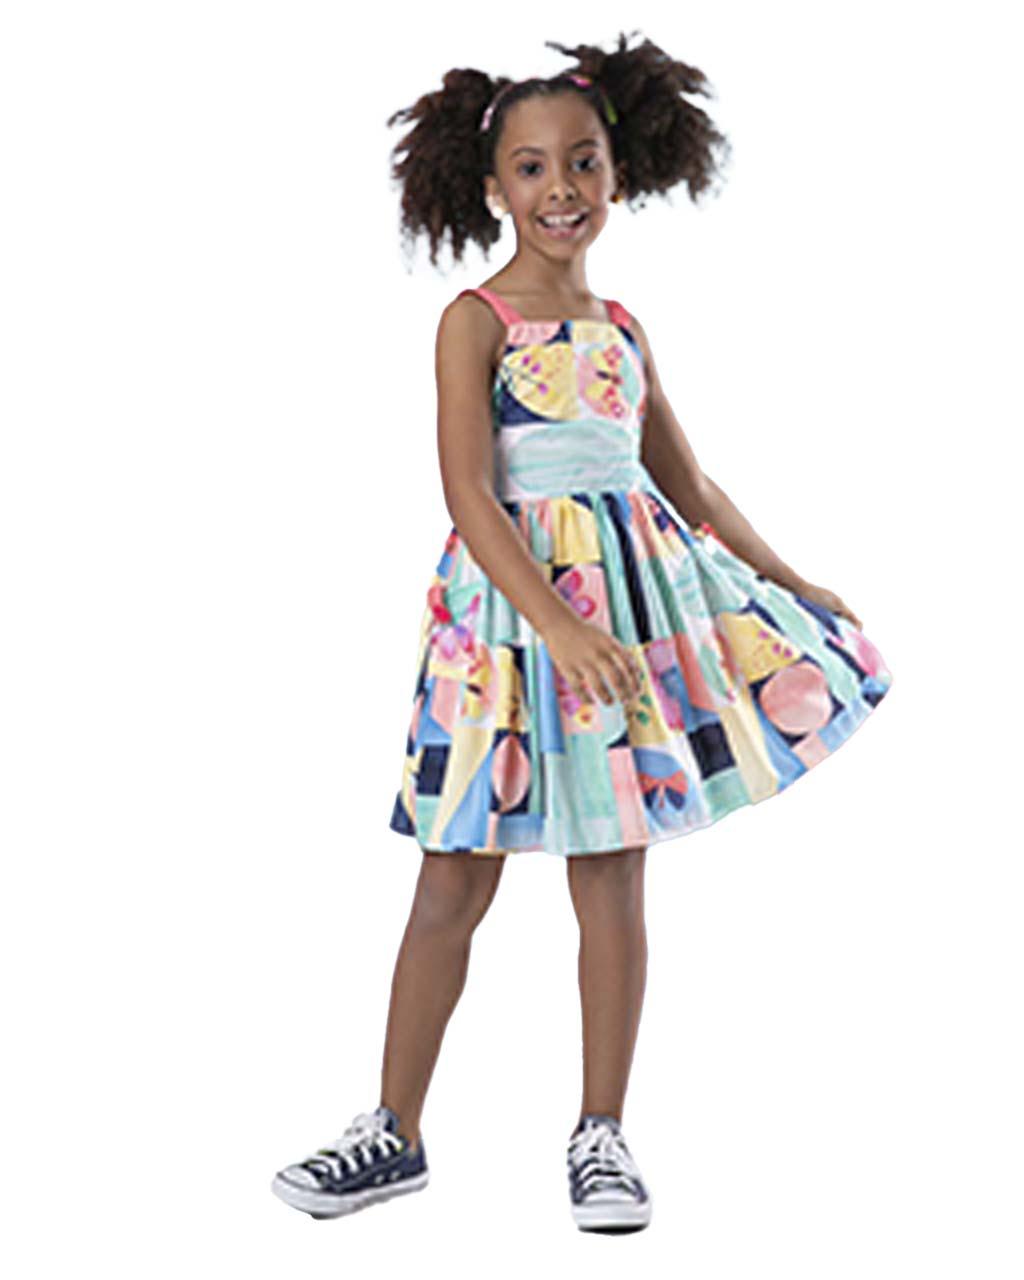 Vestido Infantil Mistura de Cores com  Borboletas Málagah